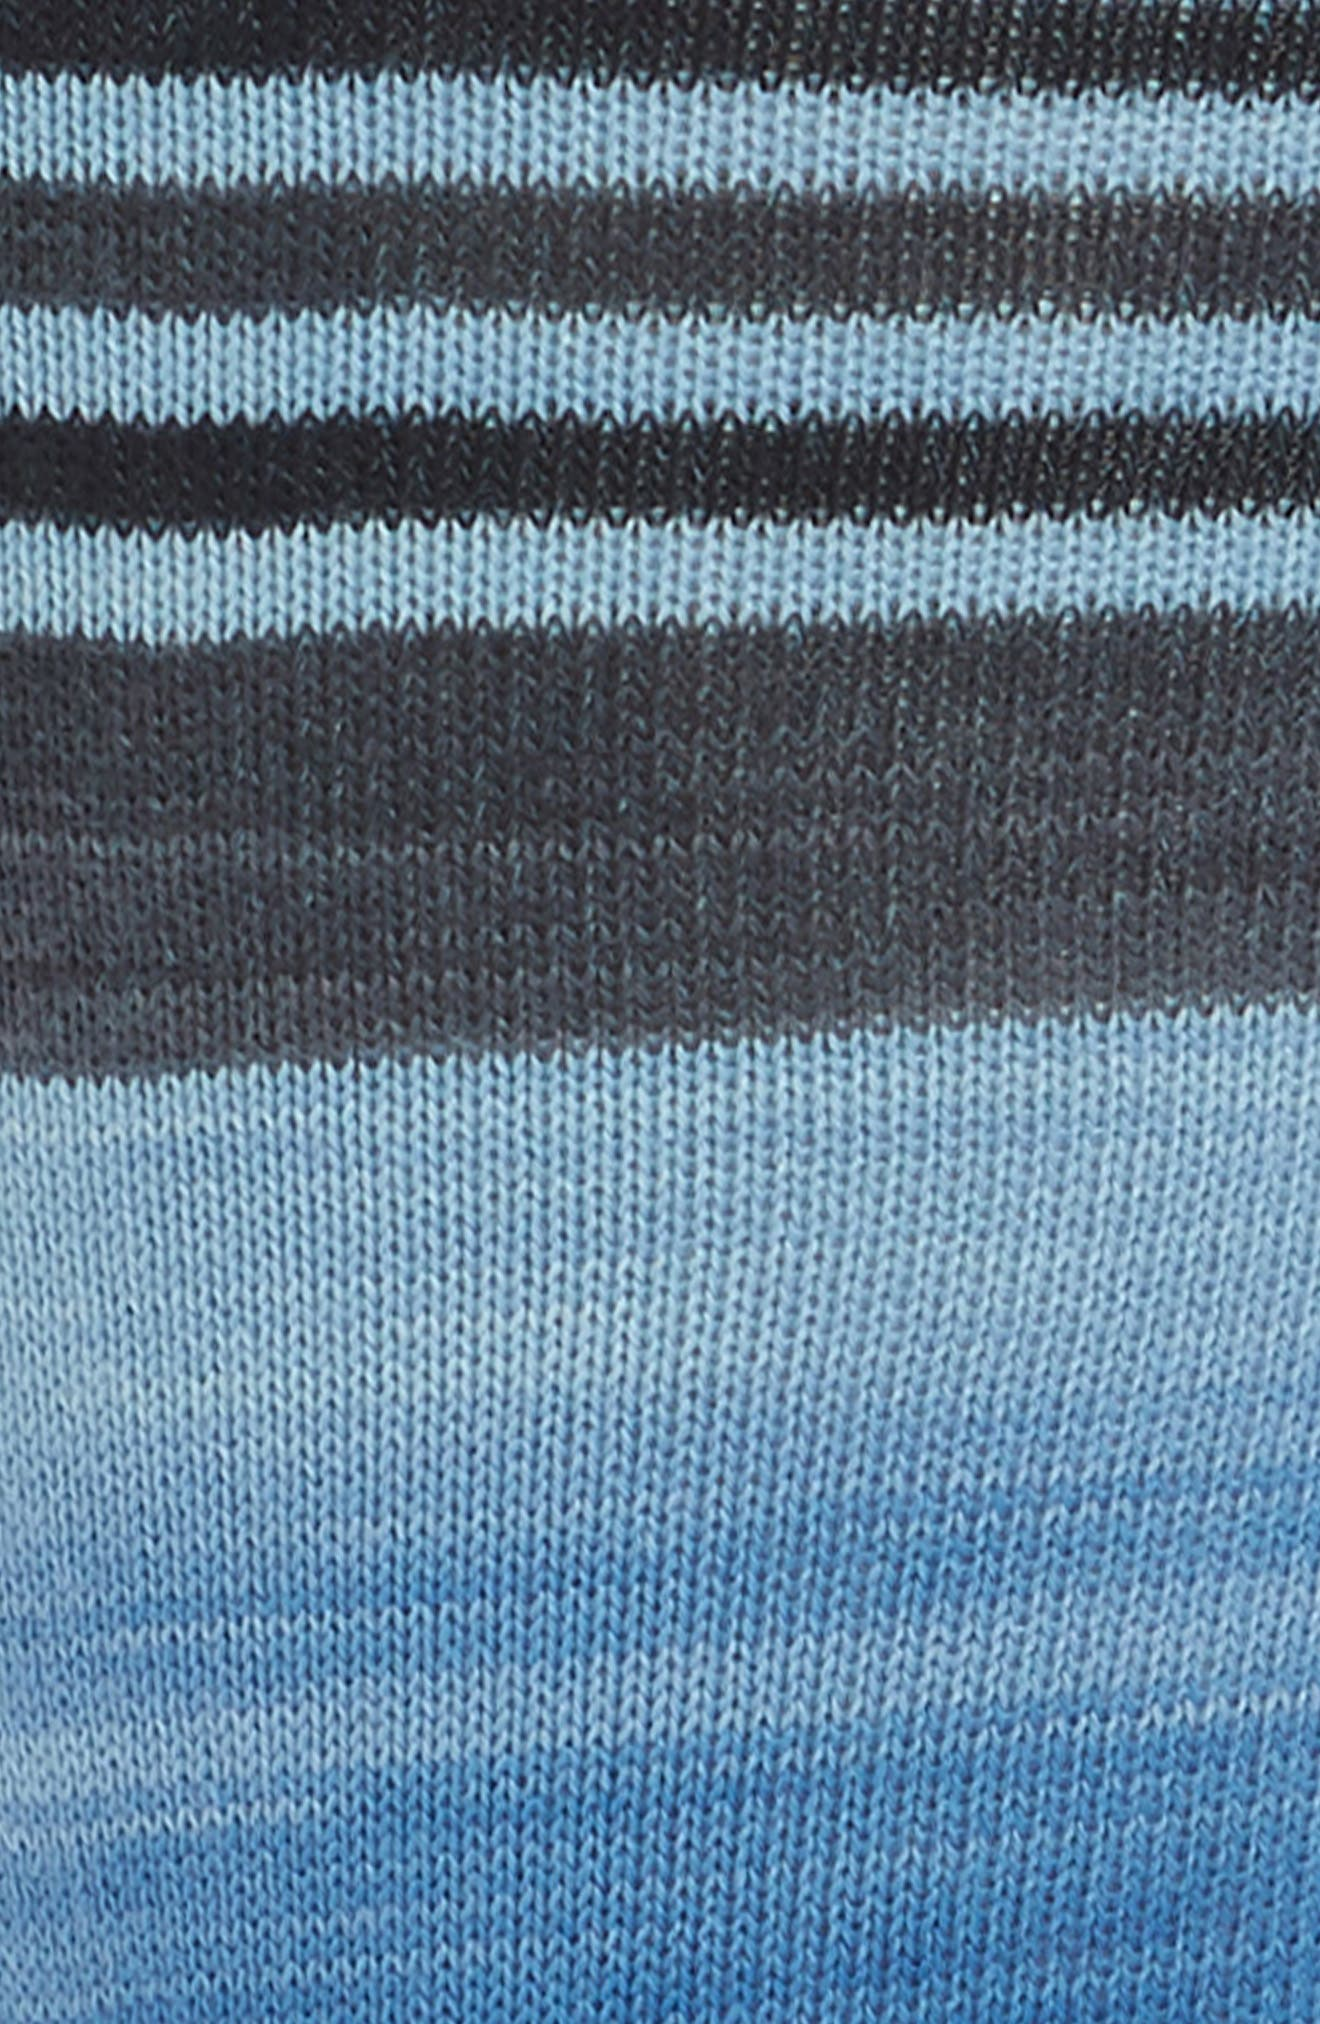 Space Dye Striped Socks,                             Alternate thumbnail 2, color,                             404